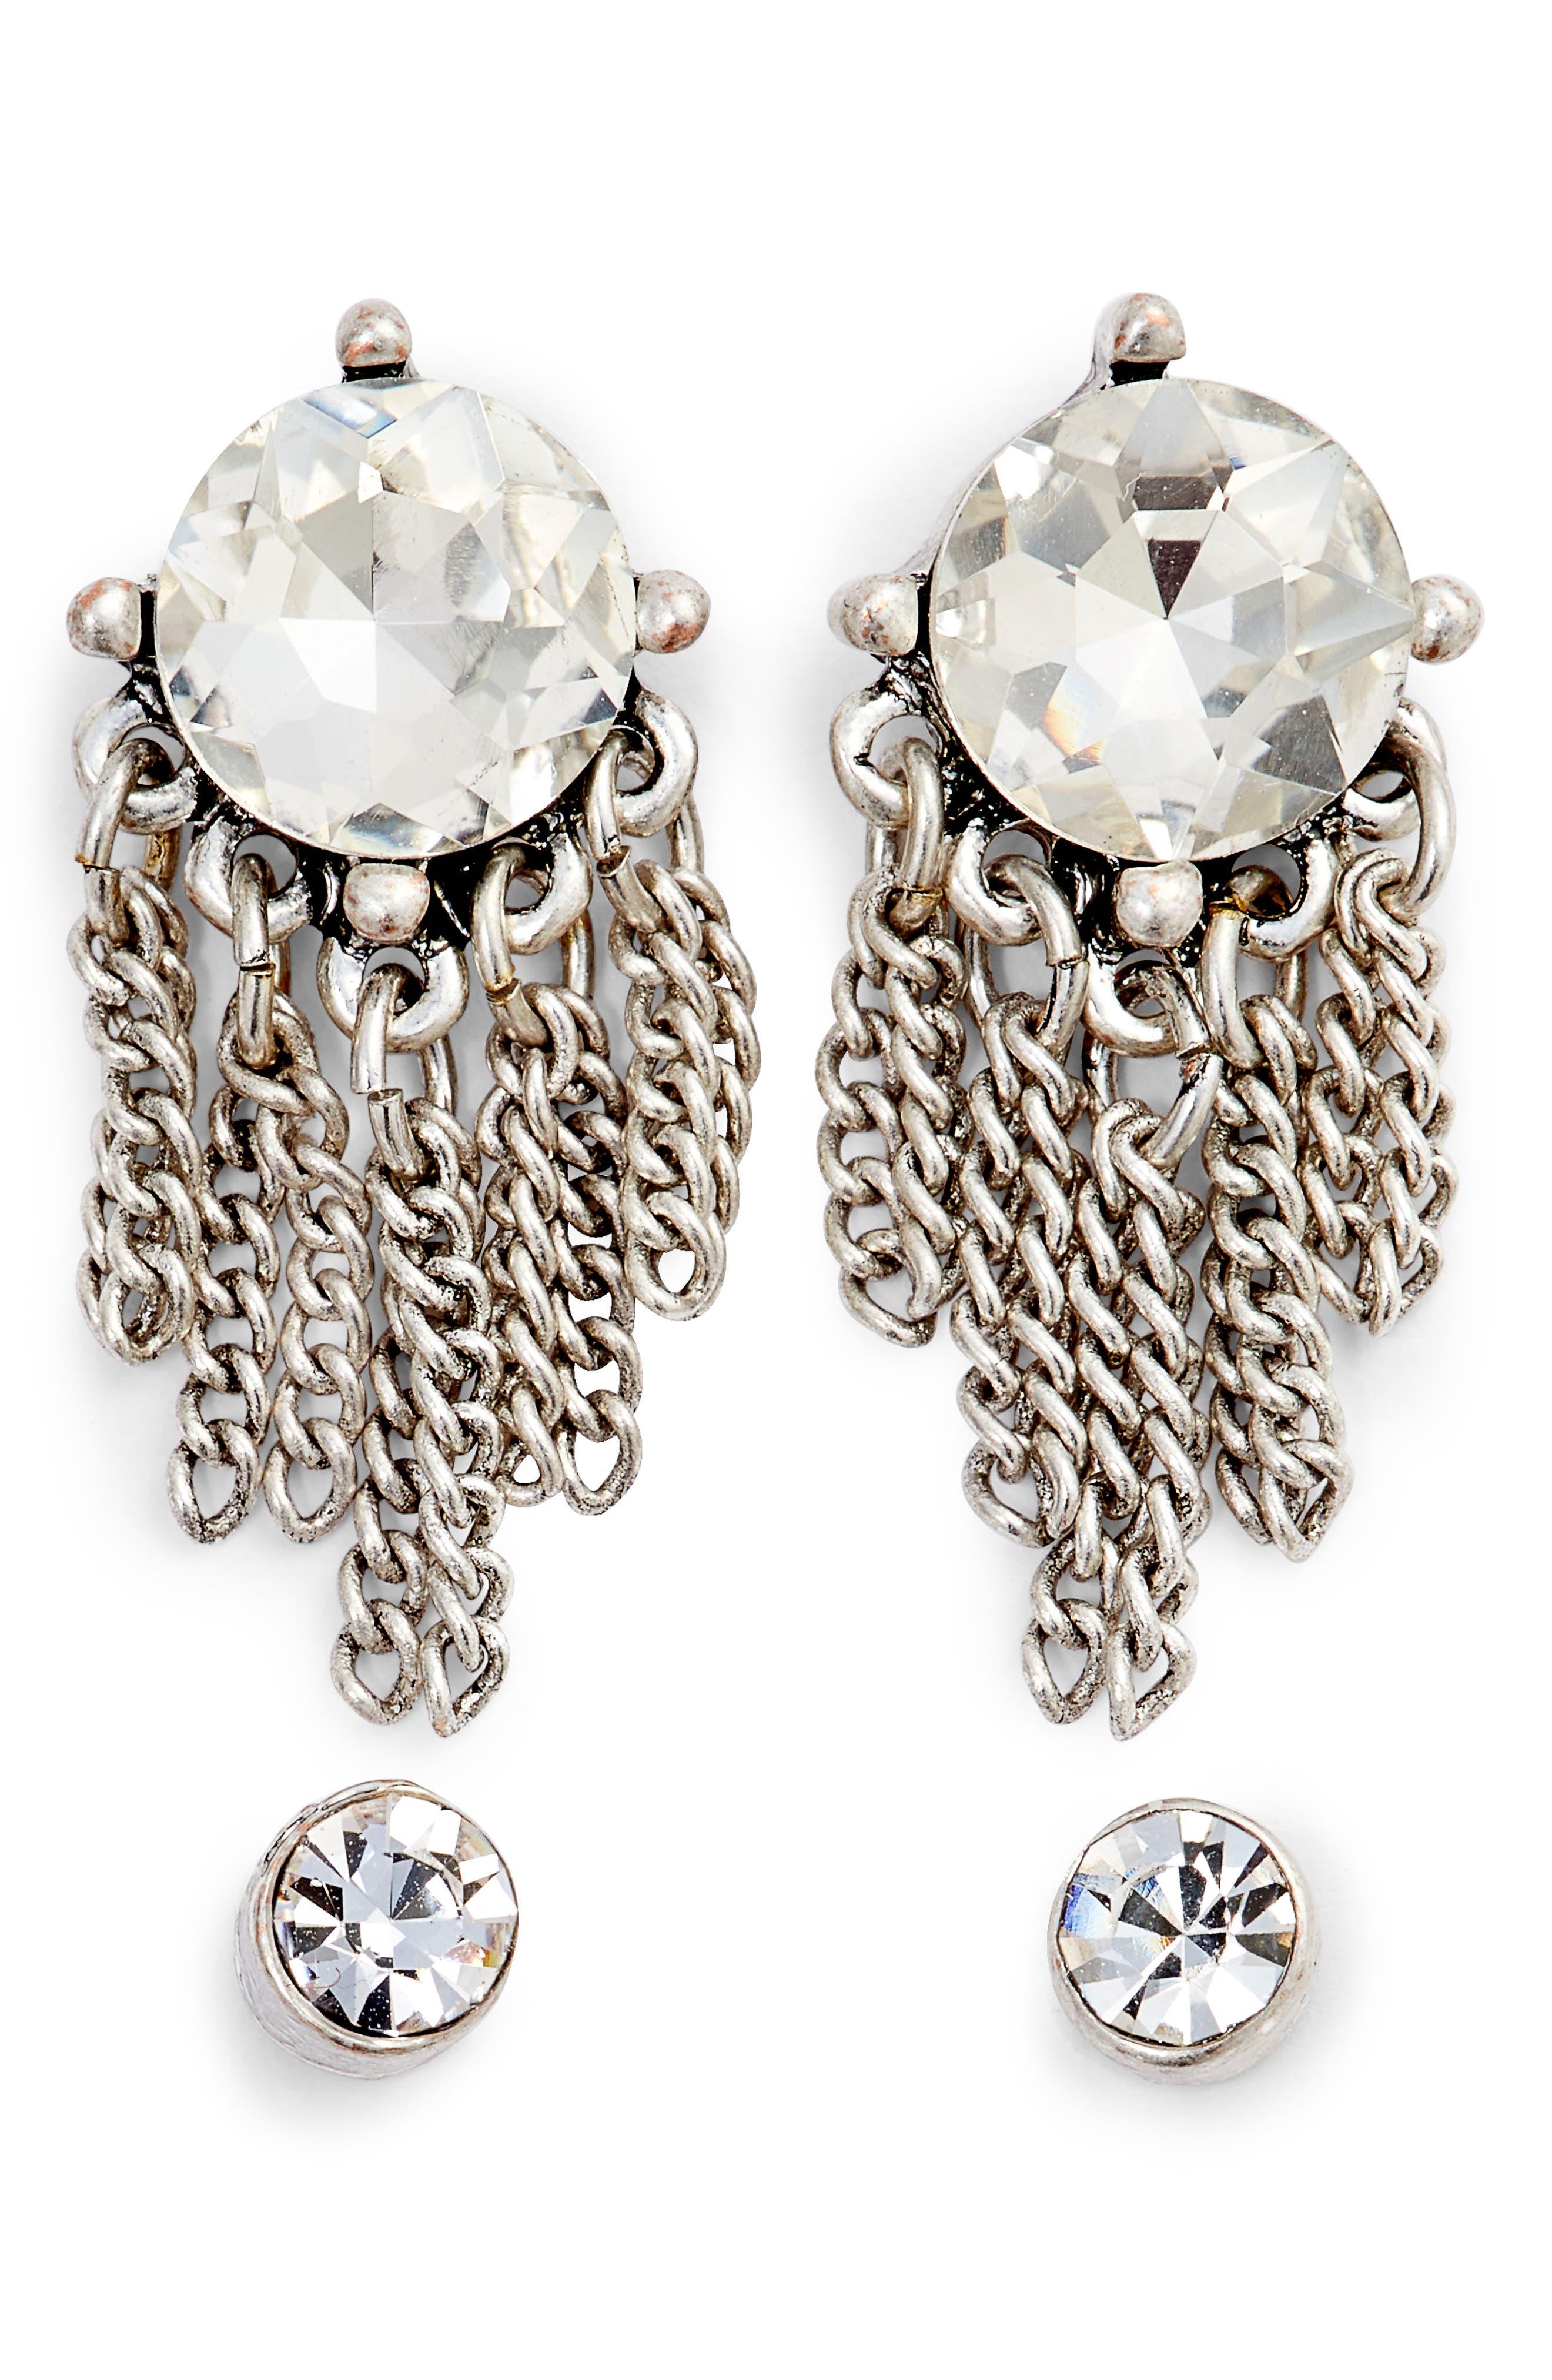 Set of Crystal Drop & Stud Earrings,                             Main thumbnail 1, color,                             040